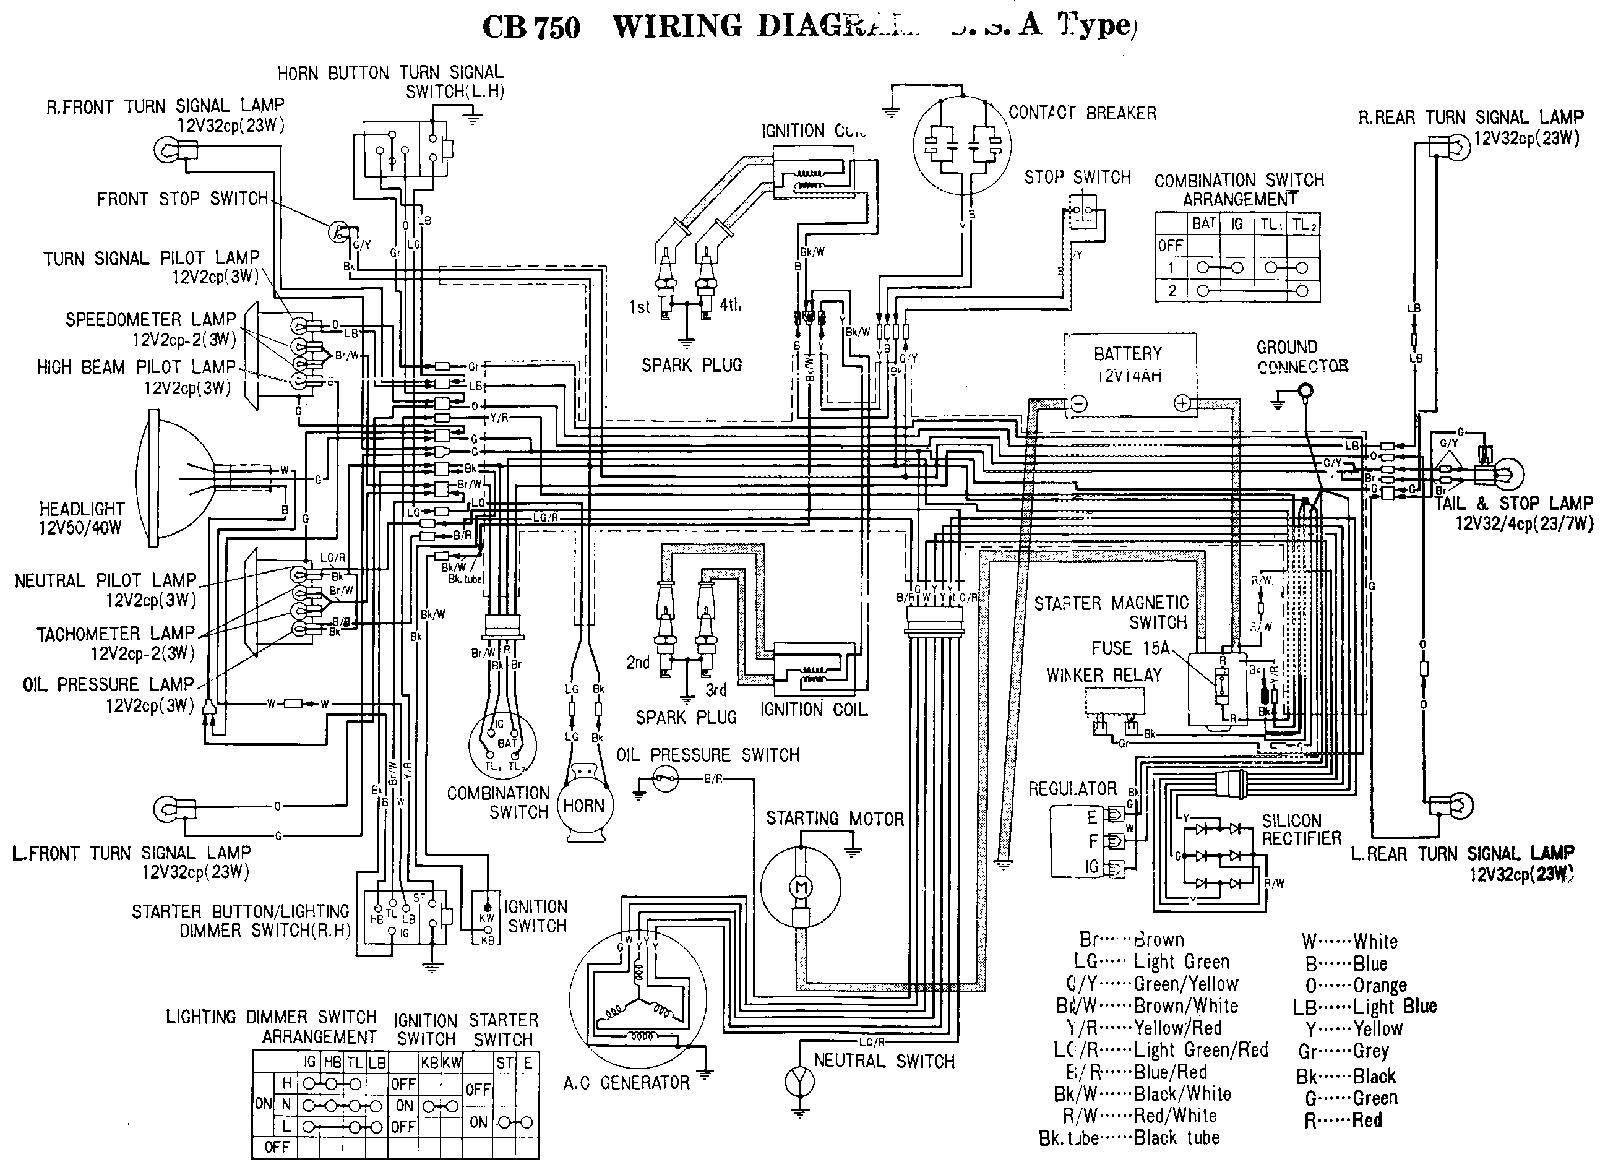 80 Cb750k Wiring Diagram - Ultima Wiring Harness For Harley for Wiring  Diagram SchematicsWiring Diagram Schematics